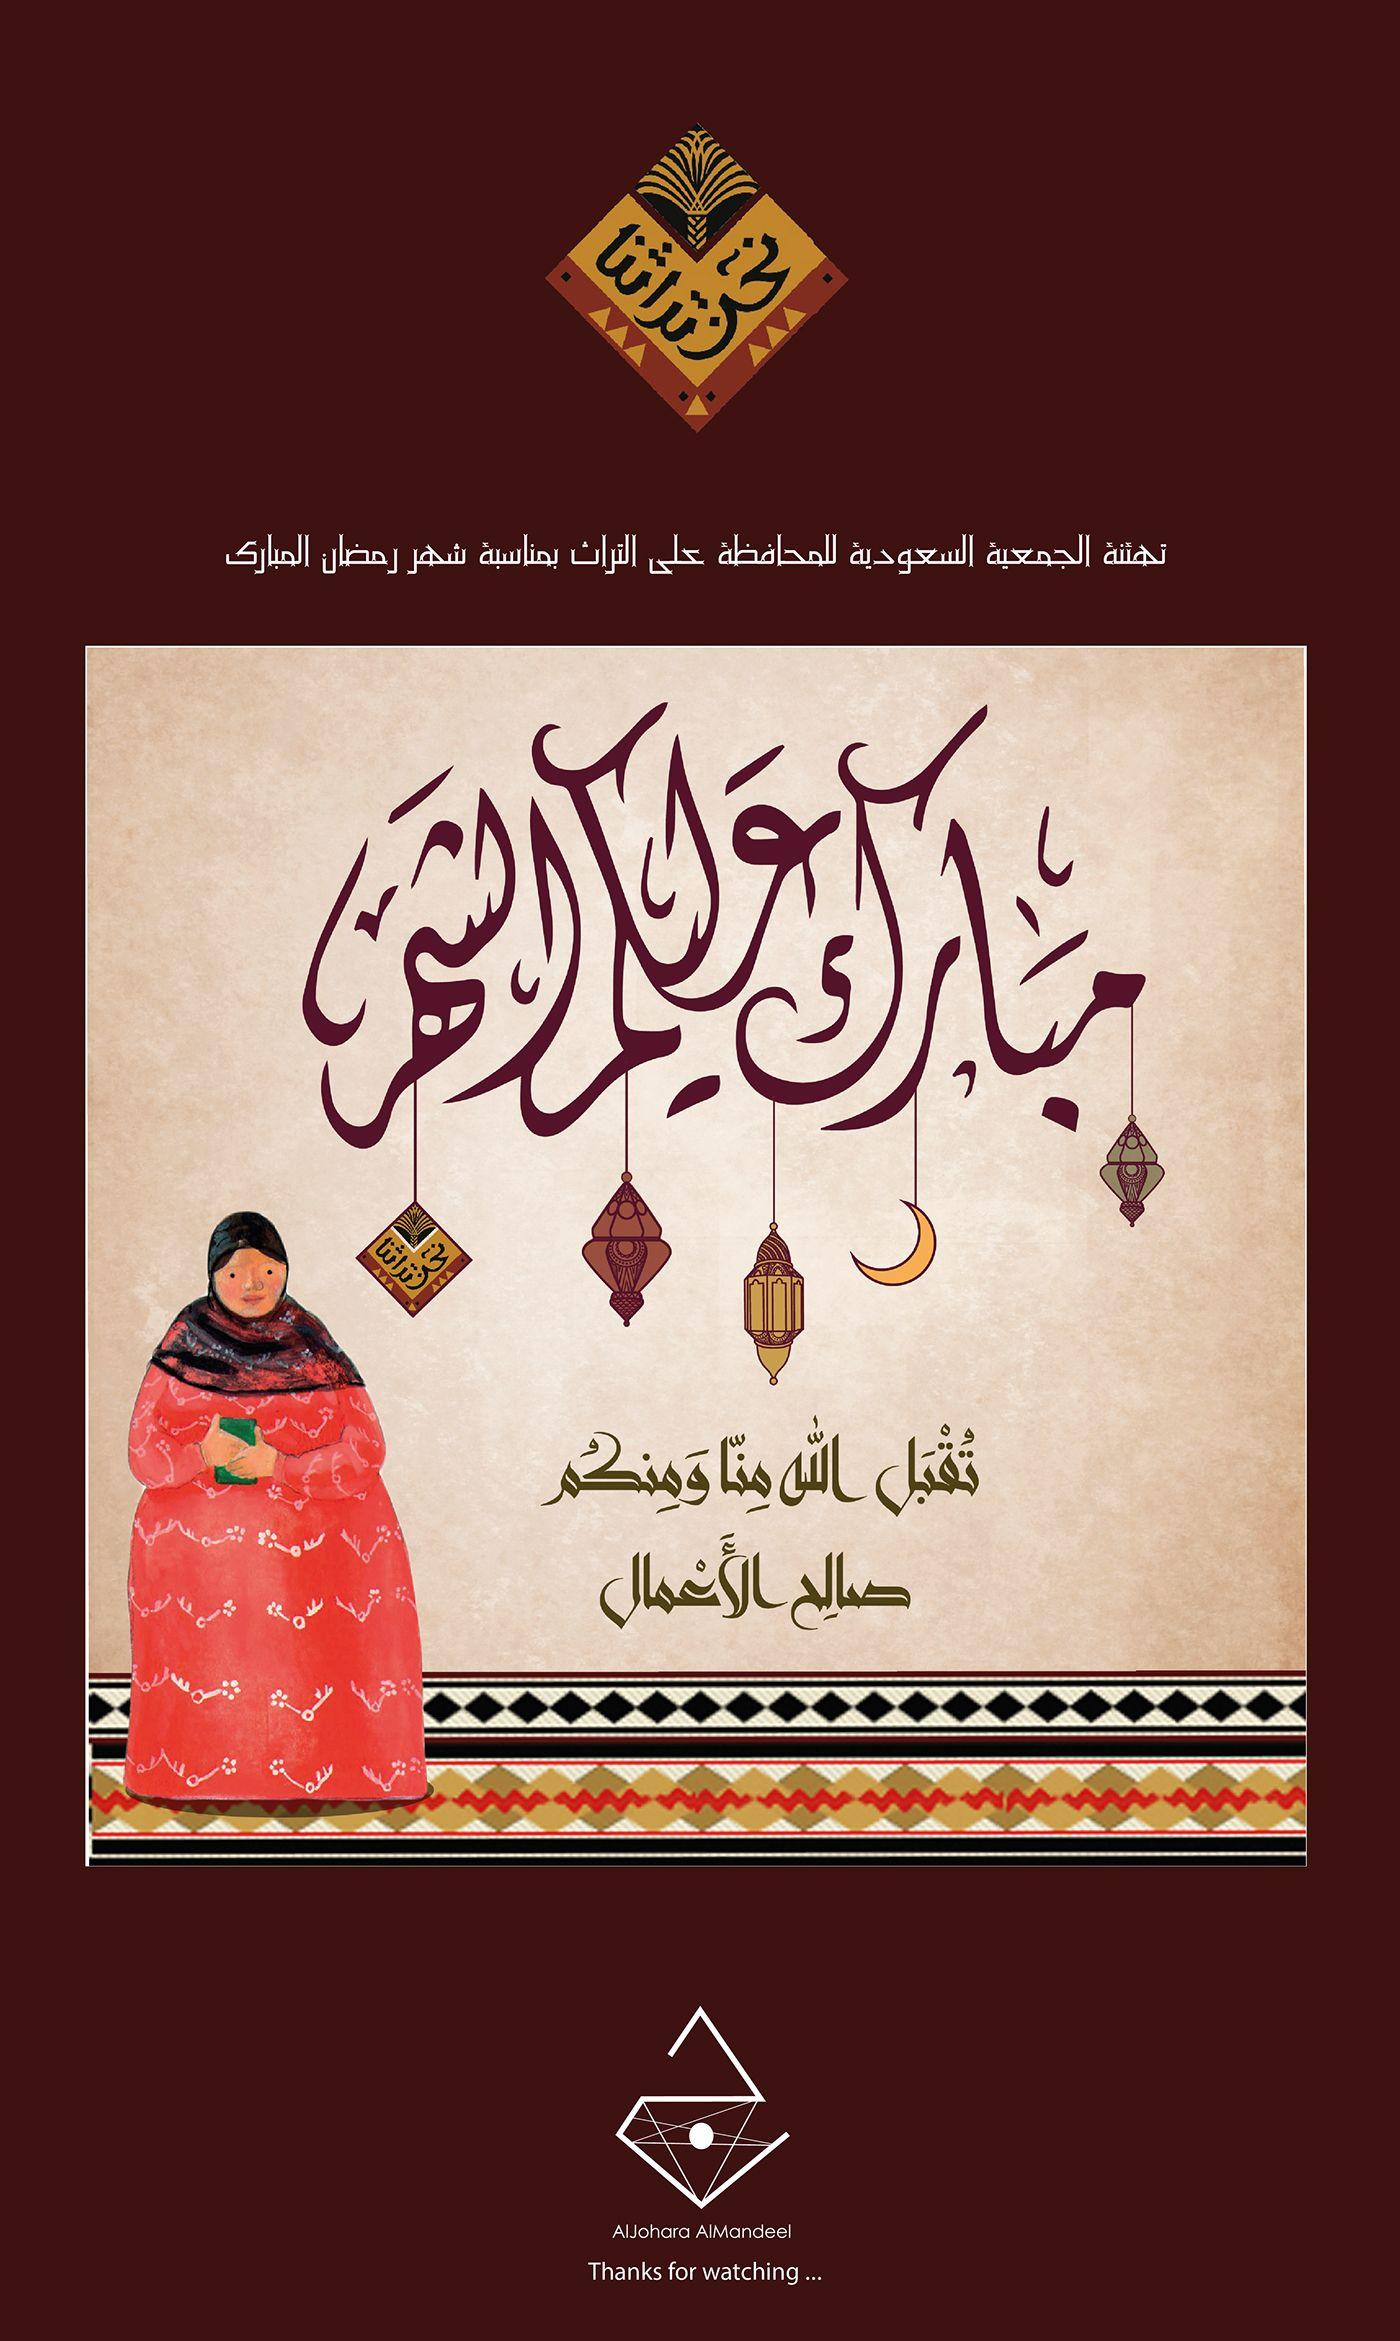 Ramadan Greeting تهنئة رمضان On Behance Http Greatislamicquotes Com Ramadan Greetings Ramadan Ramadan Quotes